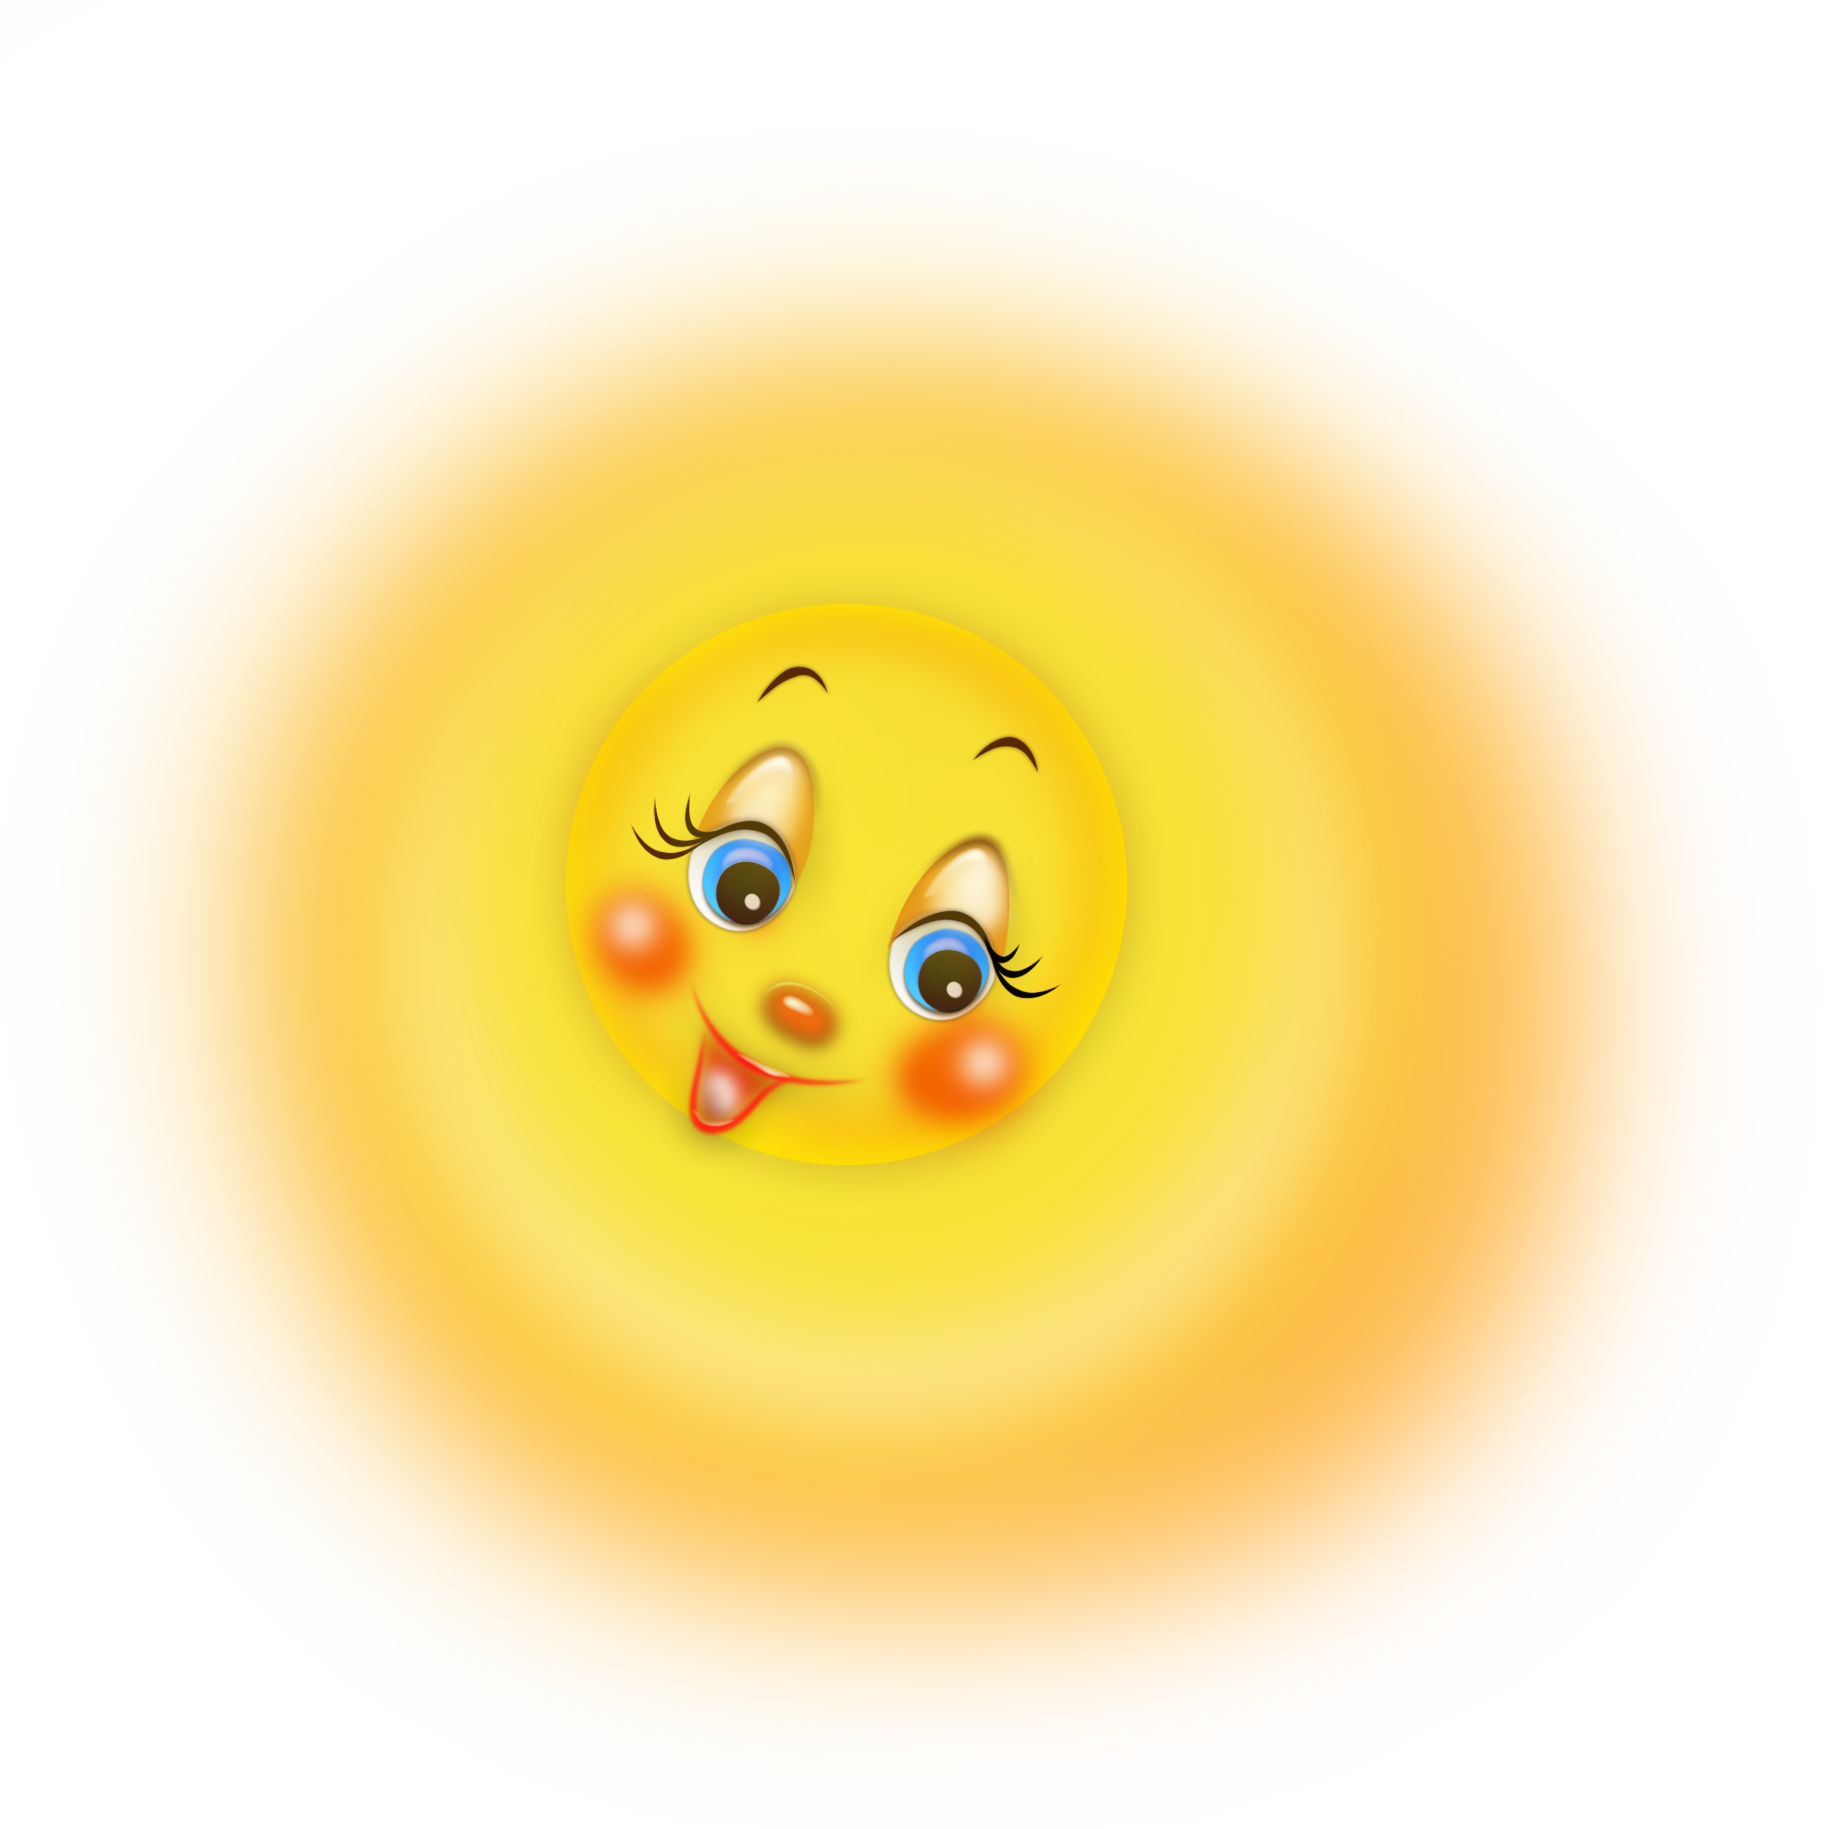 Cute sun cartoon clipart banner freeuse Transparent Cartoon Cute Sun PNG Clipart Picture | Gallery ... banner freeuse